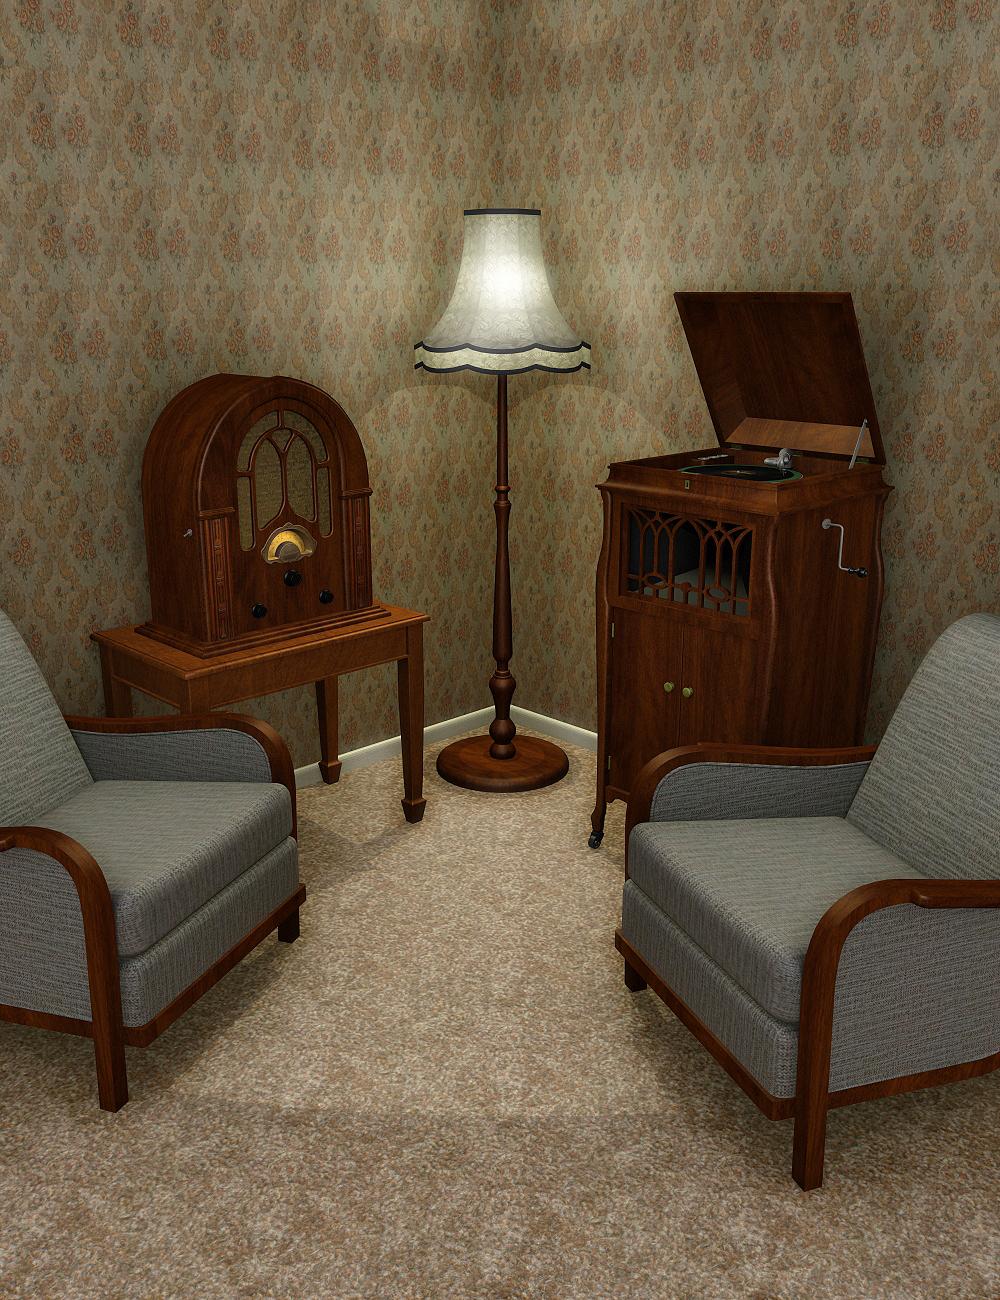 Vintage Lounge Furniture by: hypnagogia, 3D Models by Daz 3D